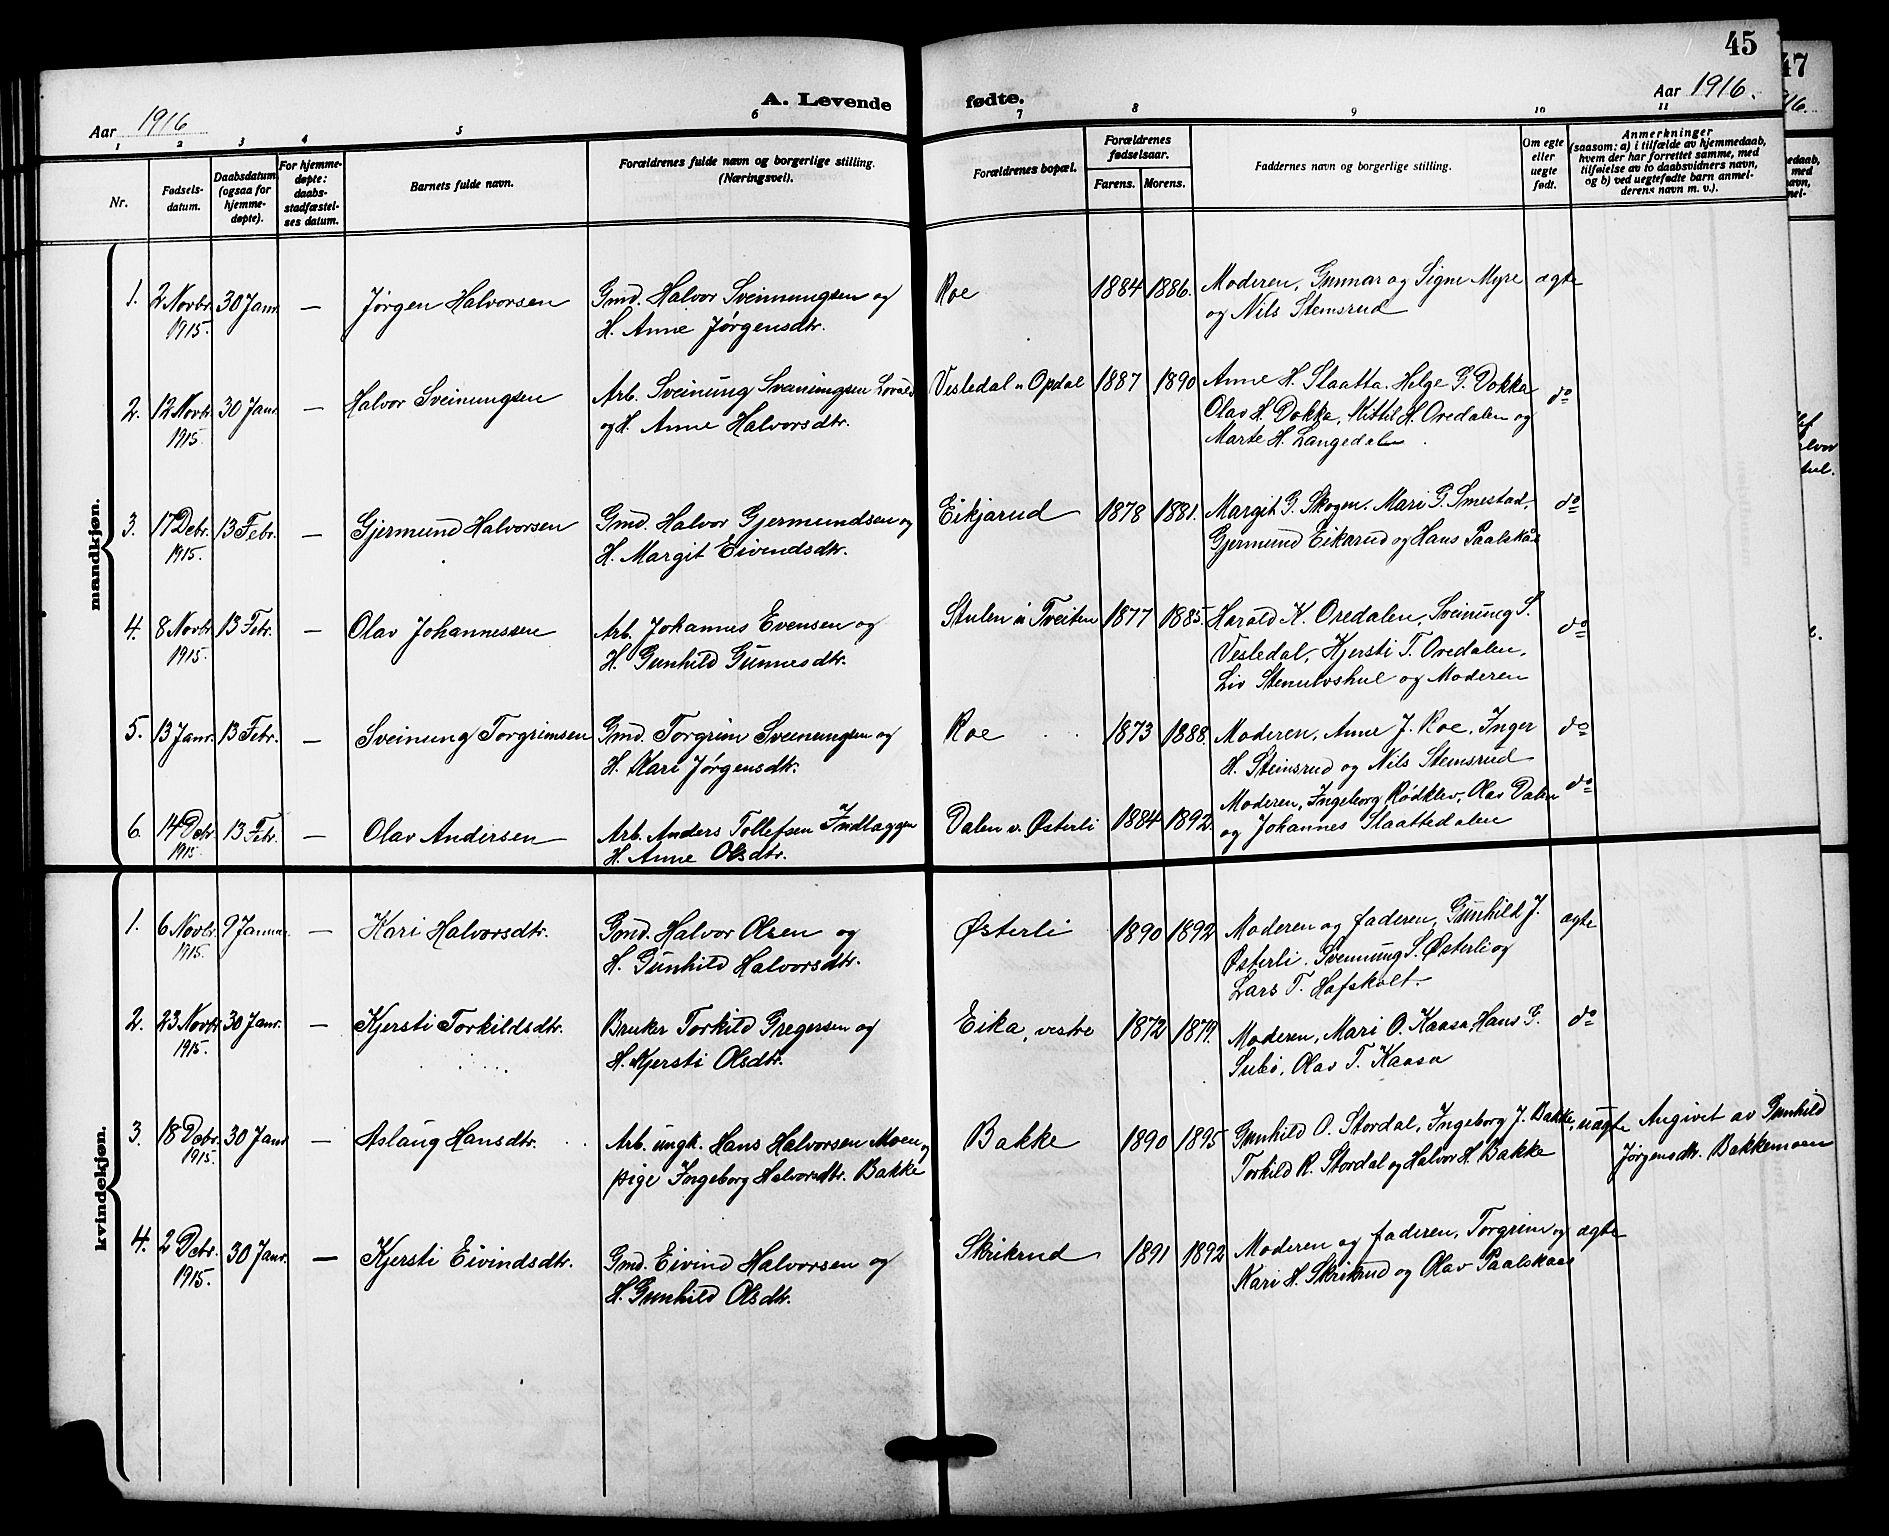 SAKO, Bø kirkebøker, G/Ga/L0007: Klokkerbok nr. 7, 1909-1924, s. 45